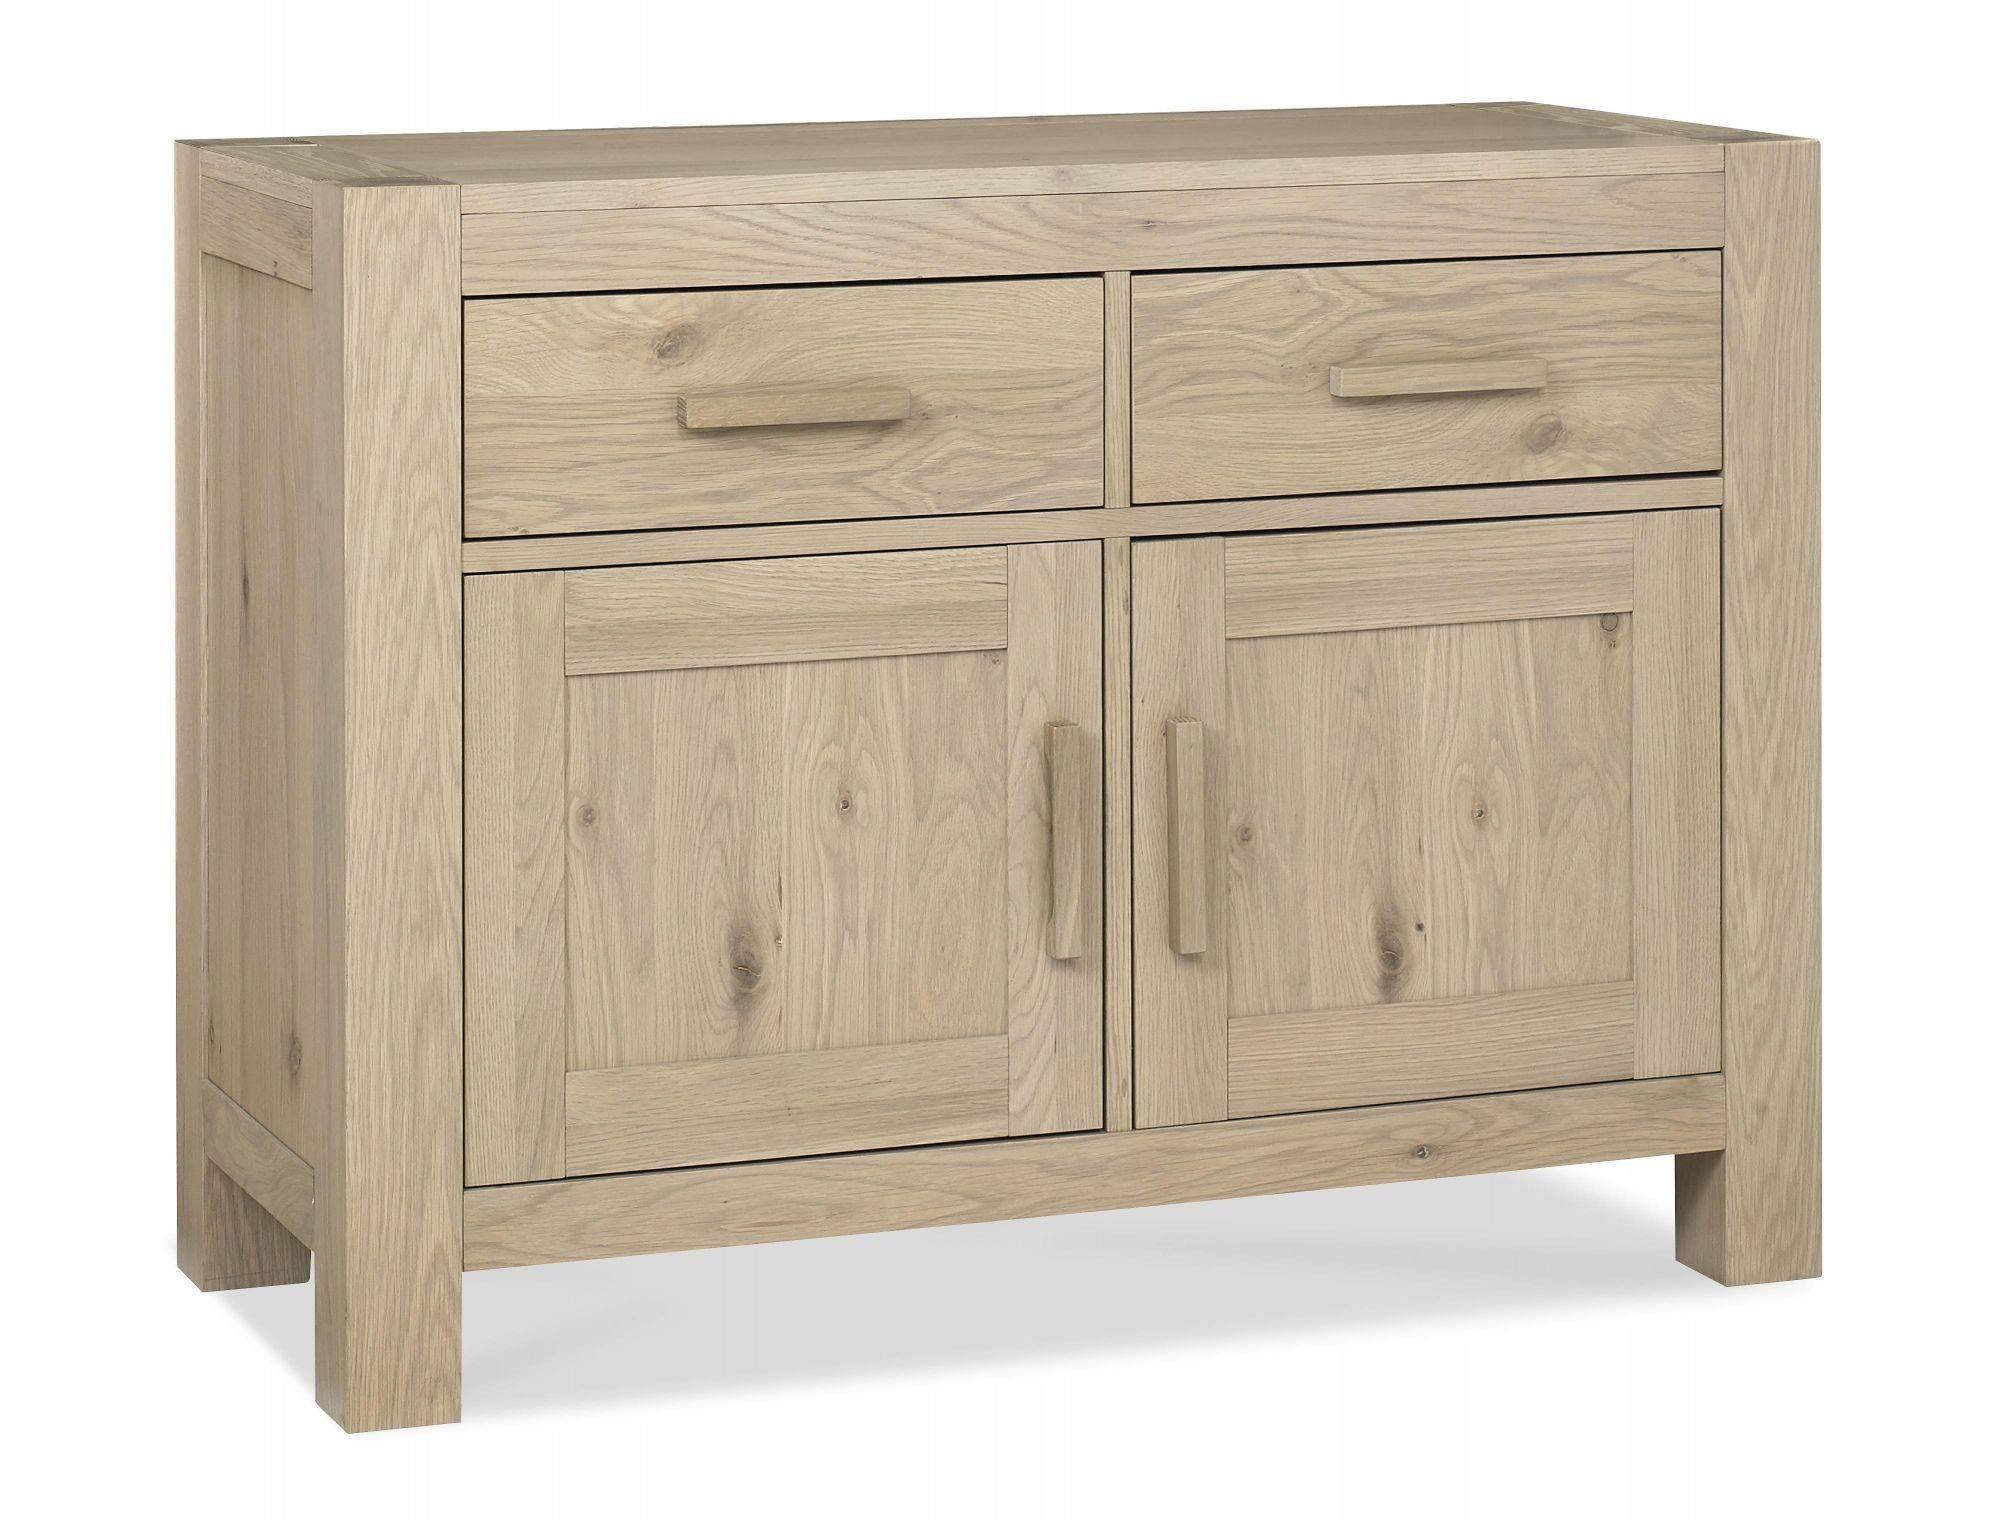 Buy Buffets And Sideboards – Beechmount Furniture Online Shop With Regard To Narrow Oak Sideboard (#6 of 20)